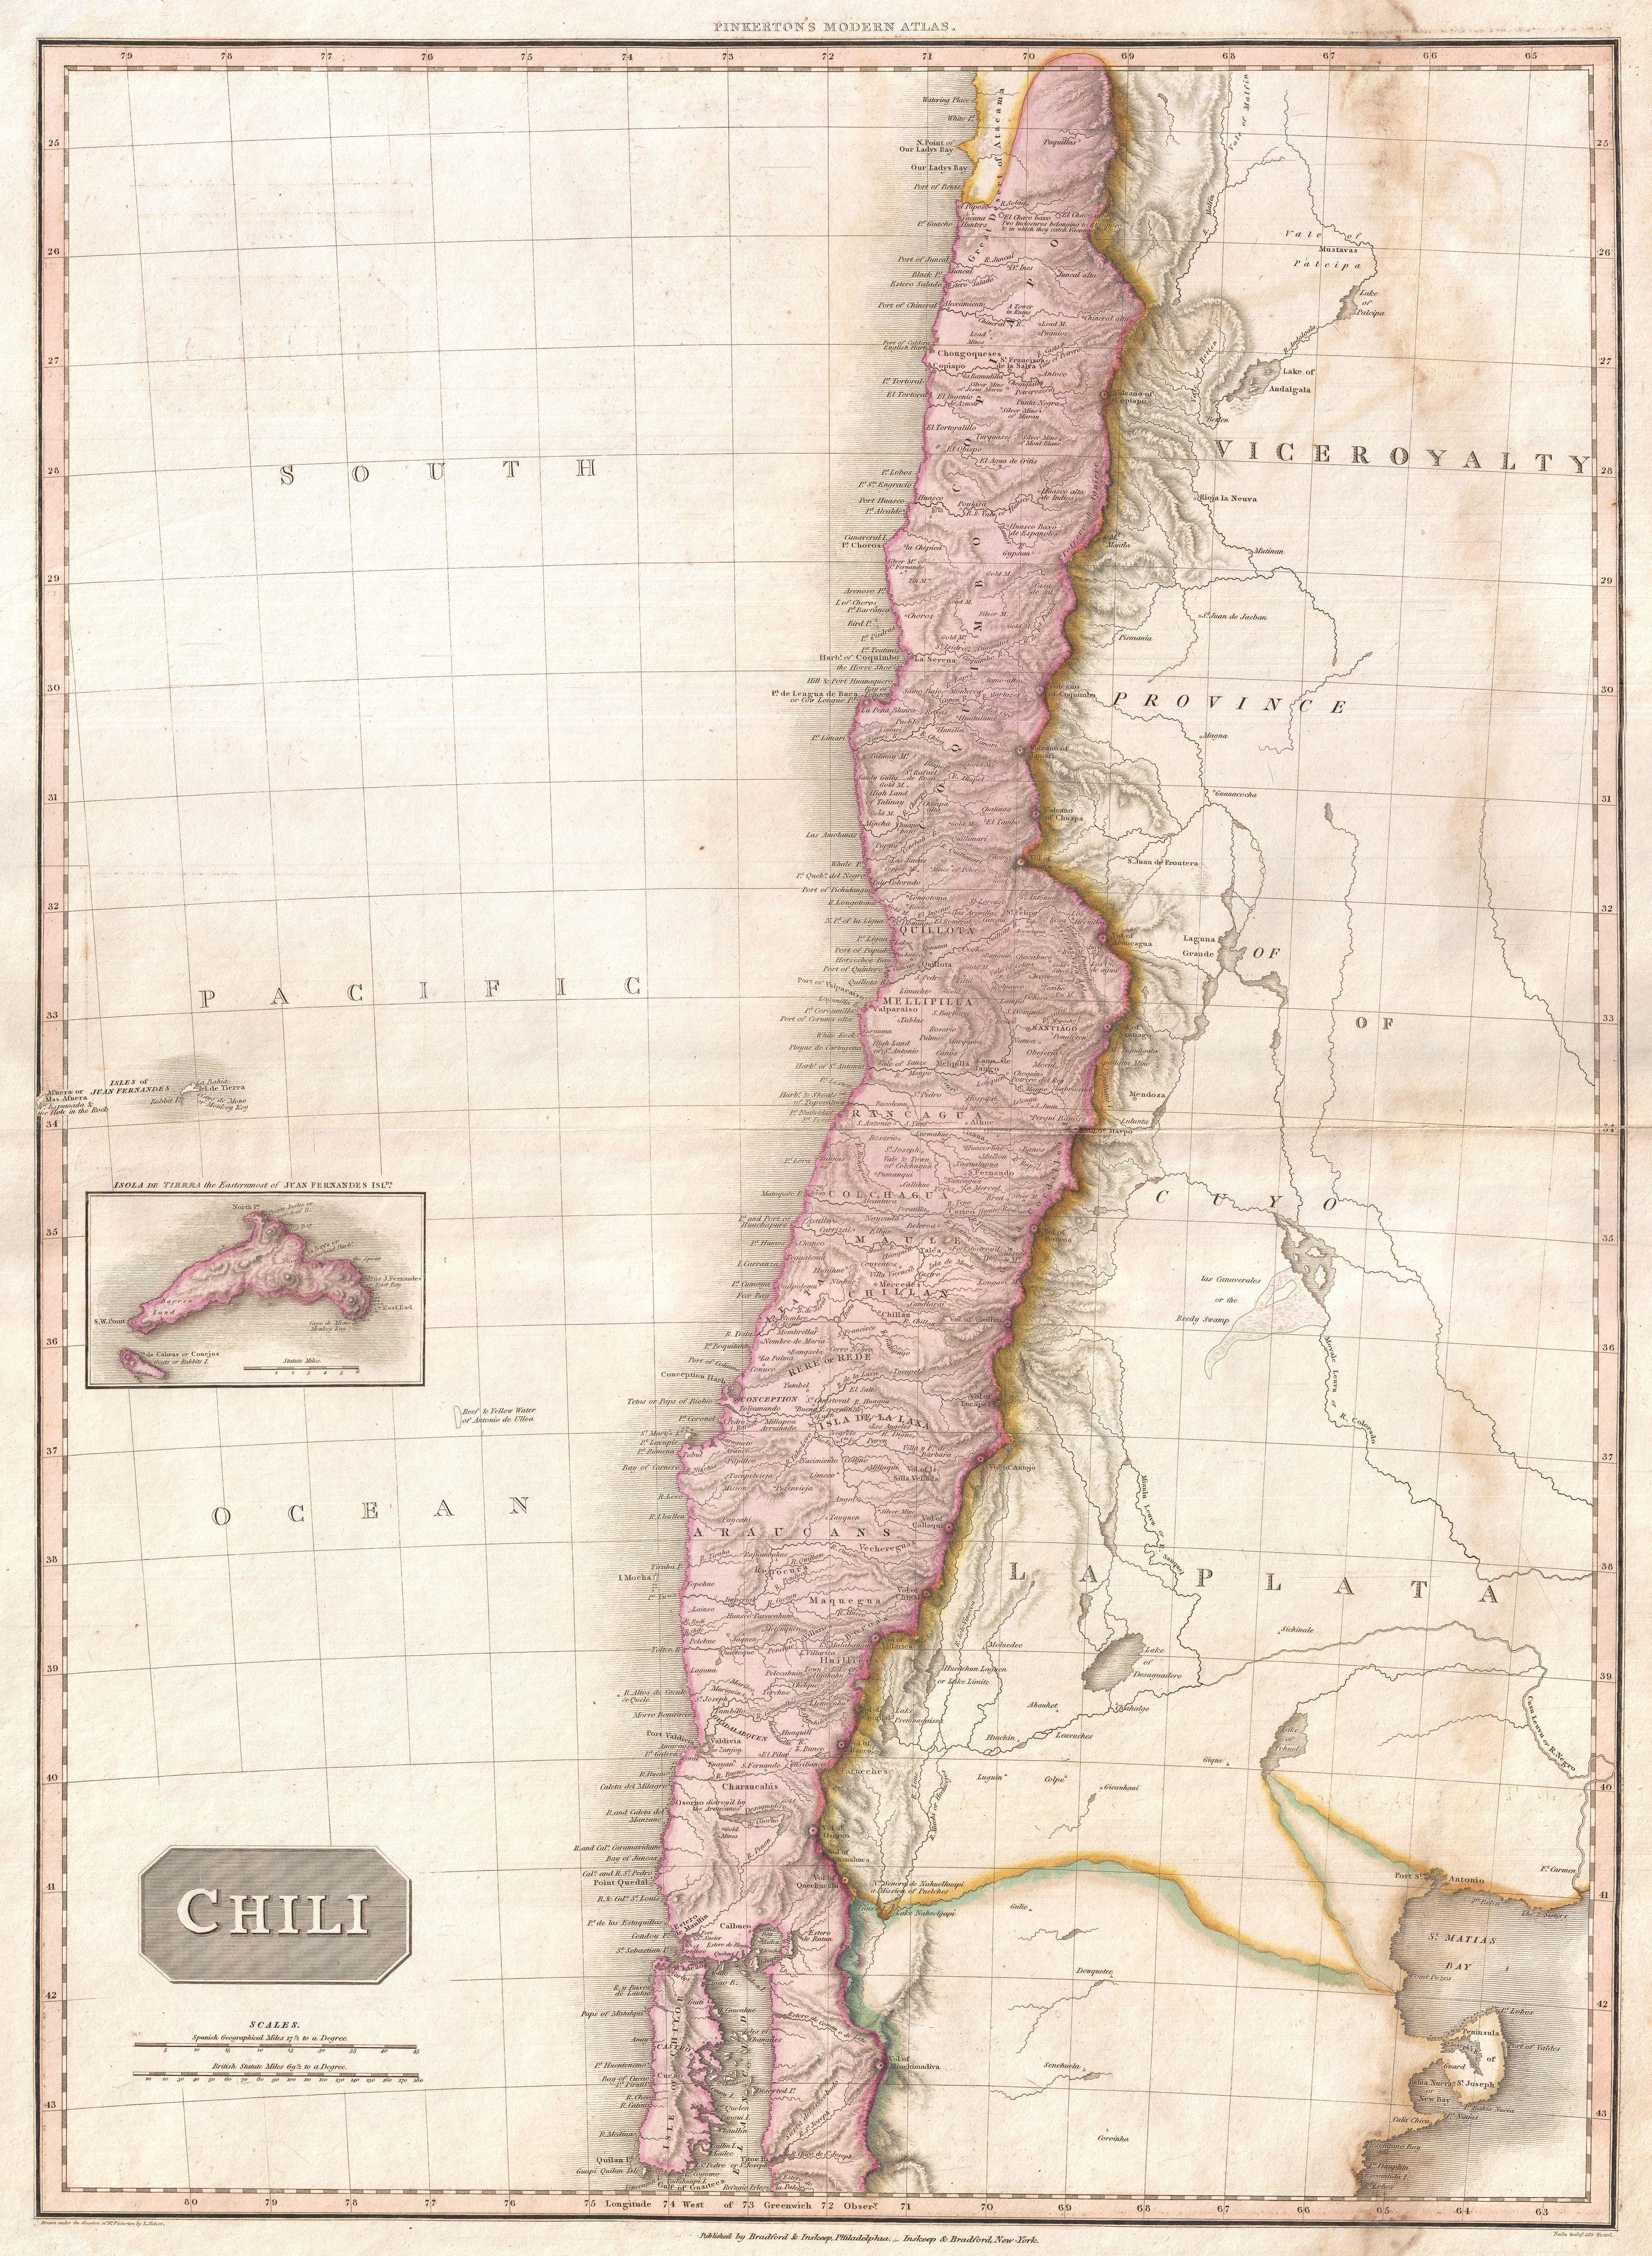 Pinkerton map of Chile, 1818